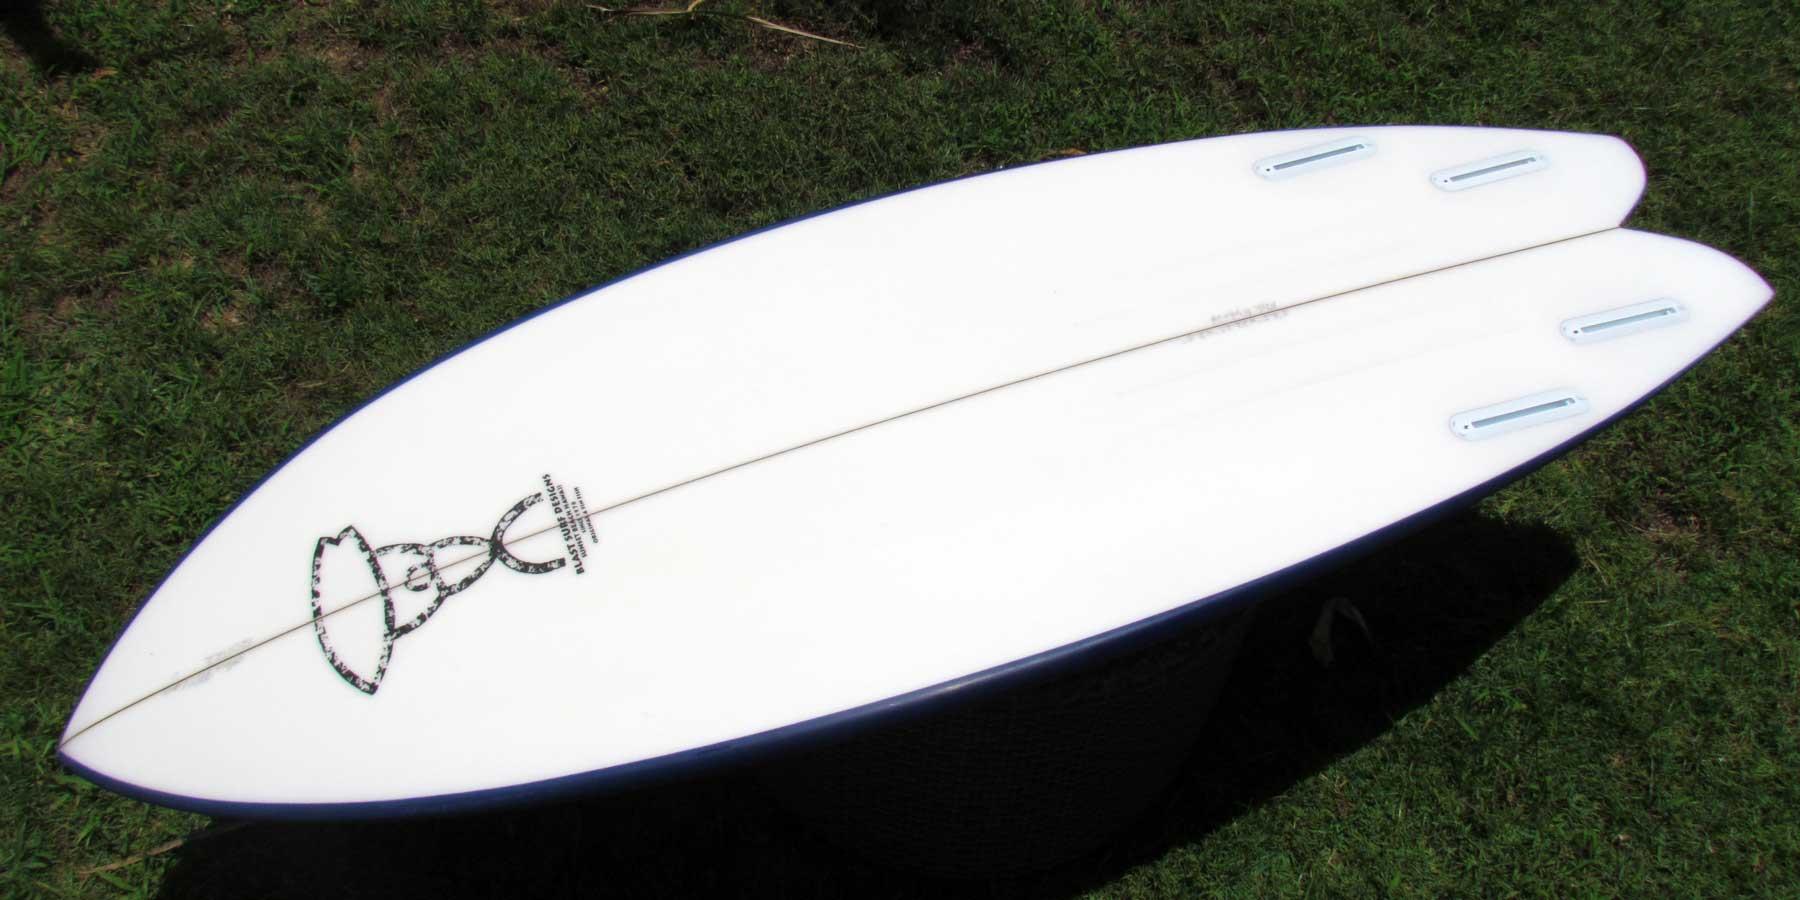 Blast fish hybrid blast surf designs hawaii for Hybrid fish surfboard